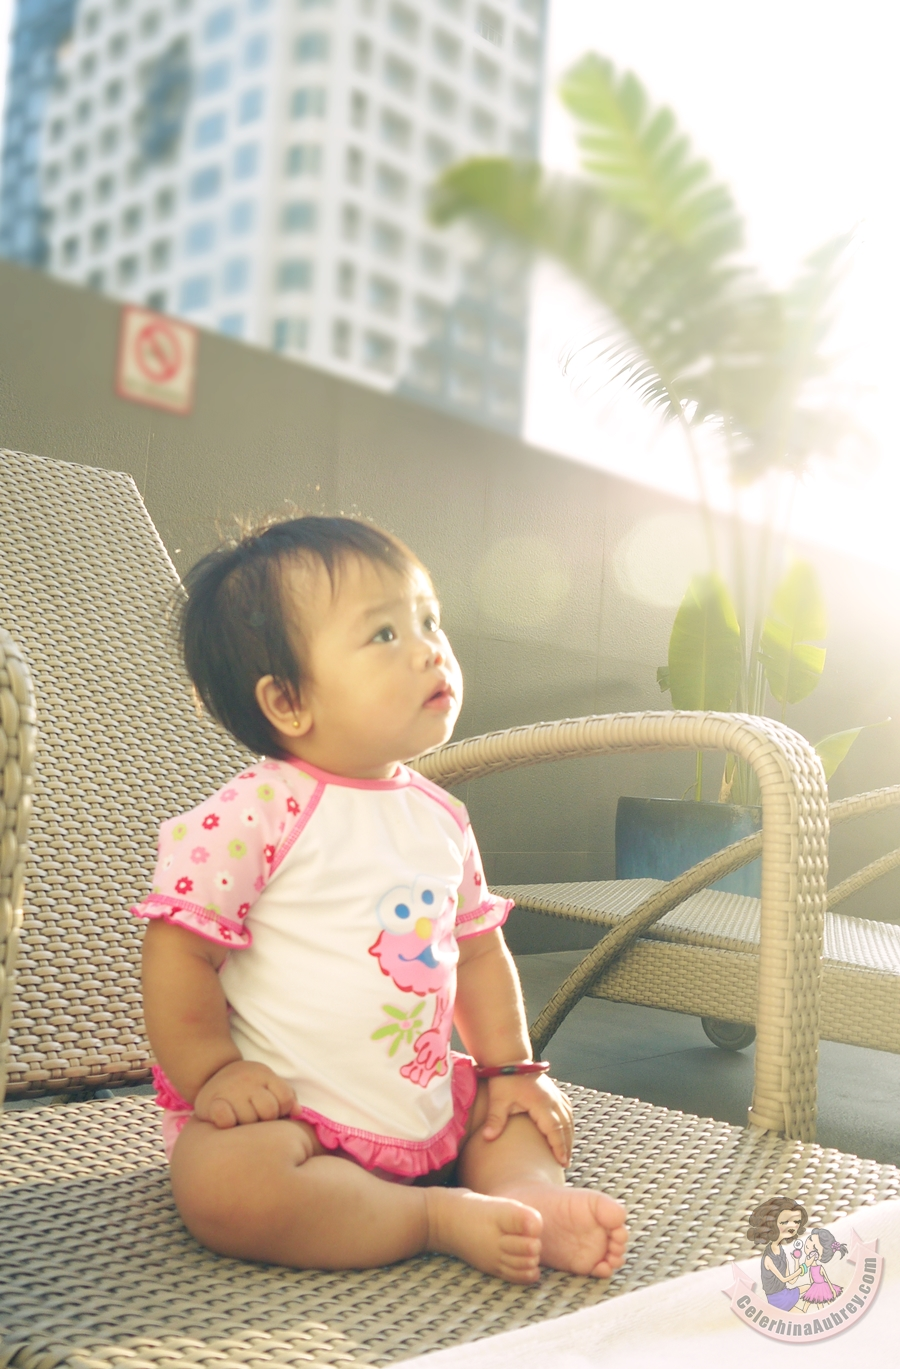 Target-Baby-Swimsuit-Girls (5)